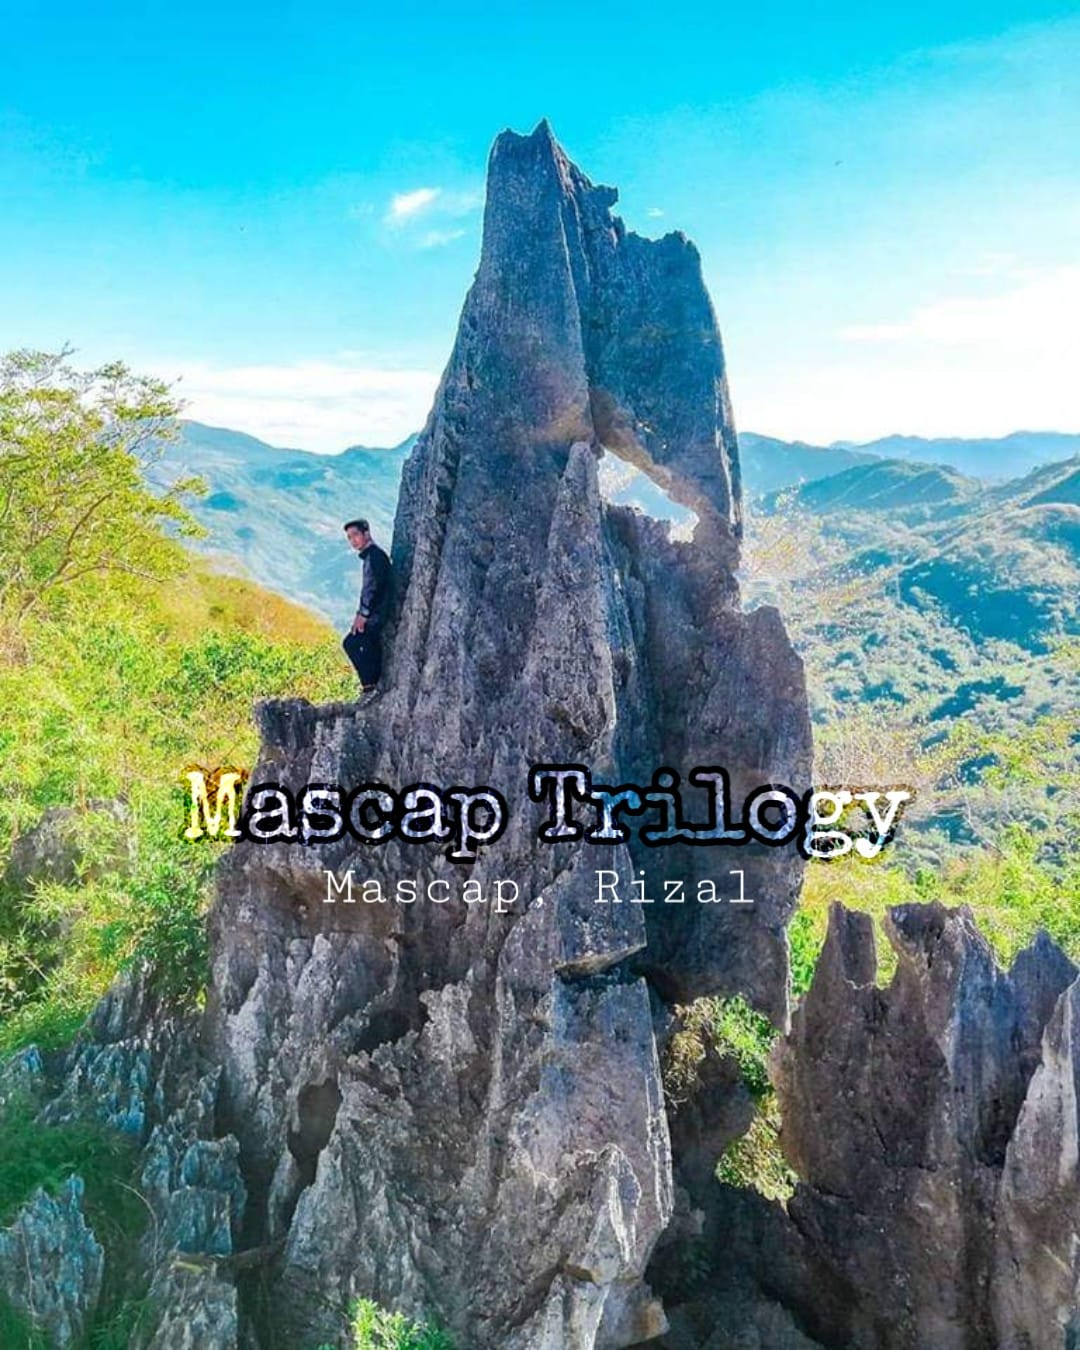 MASCAP TRILOGY